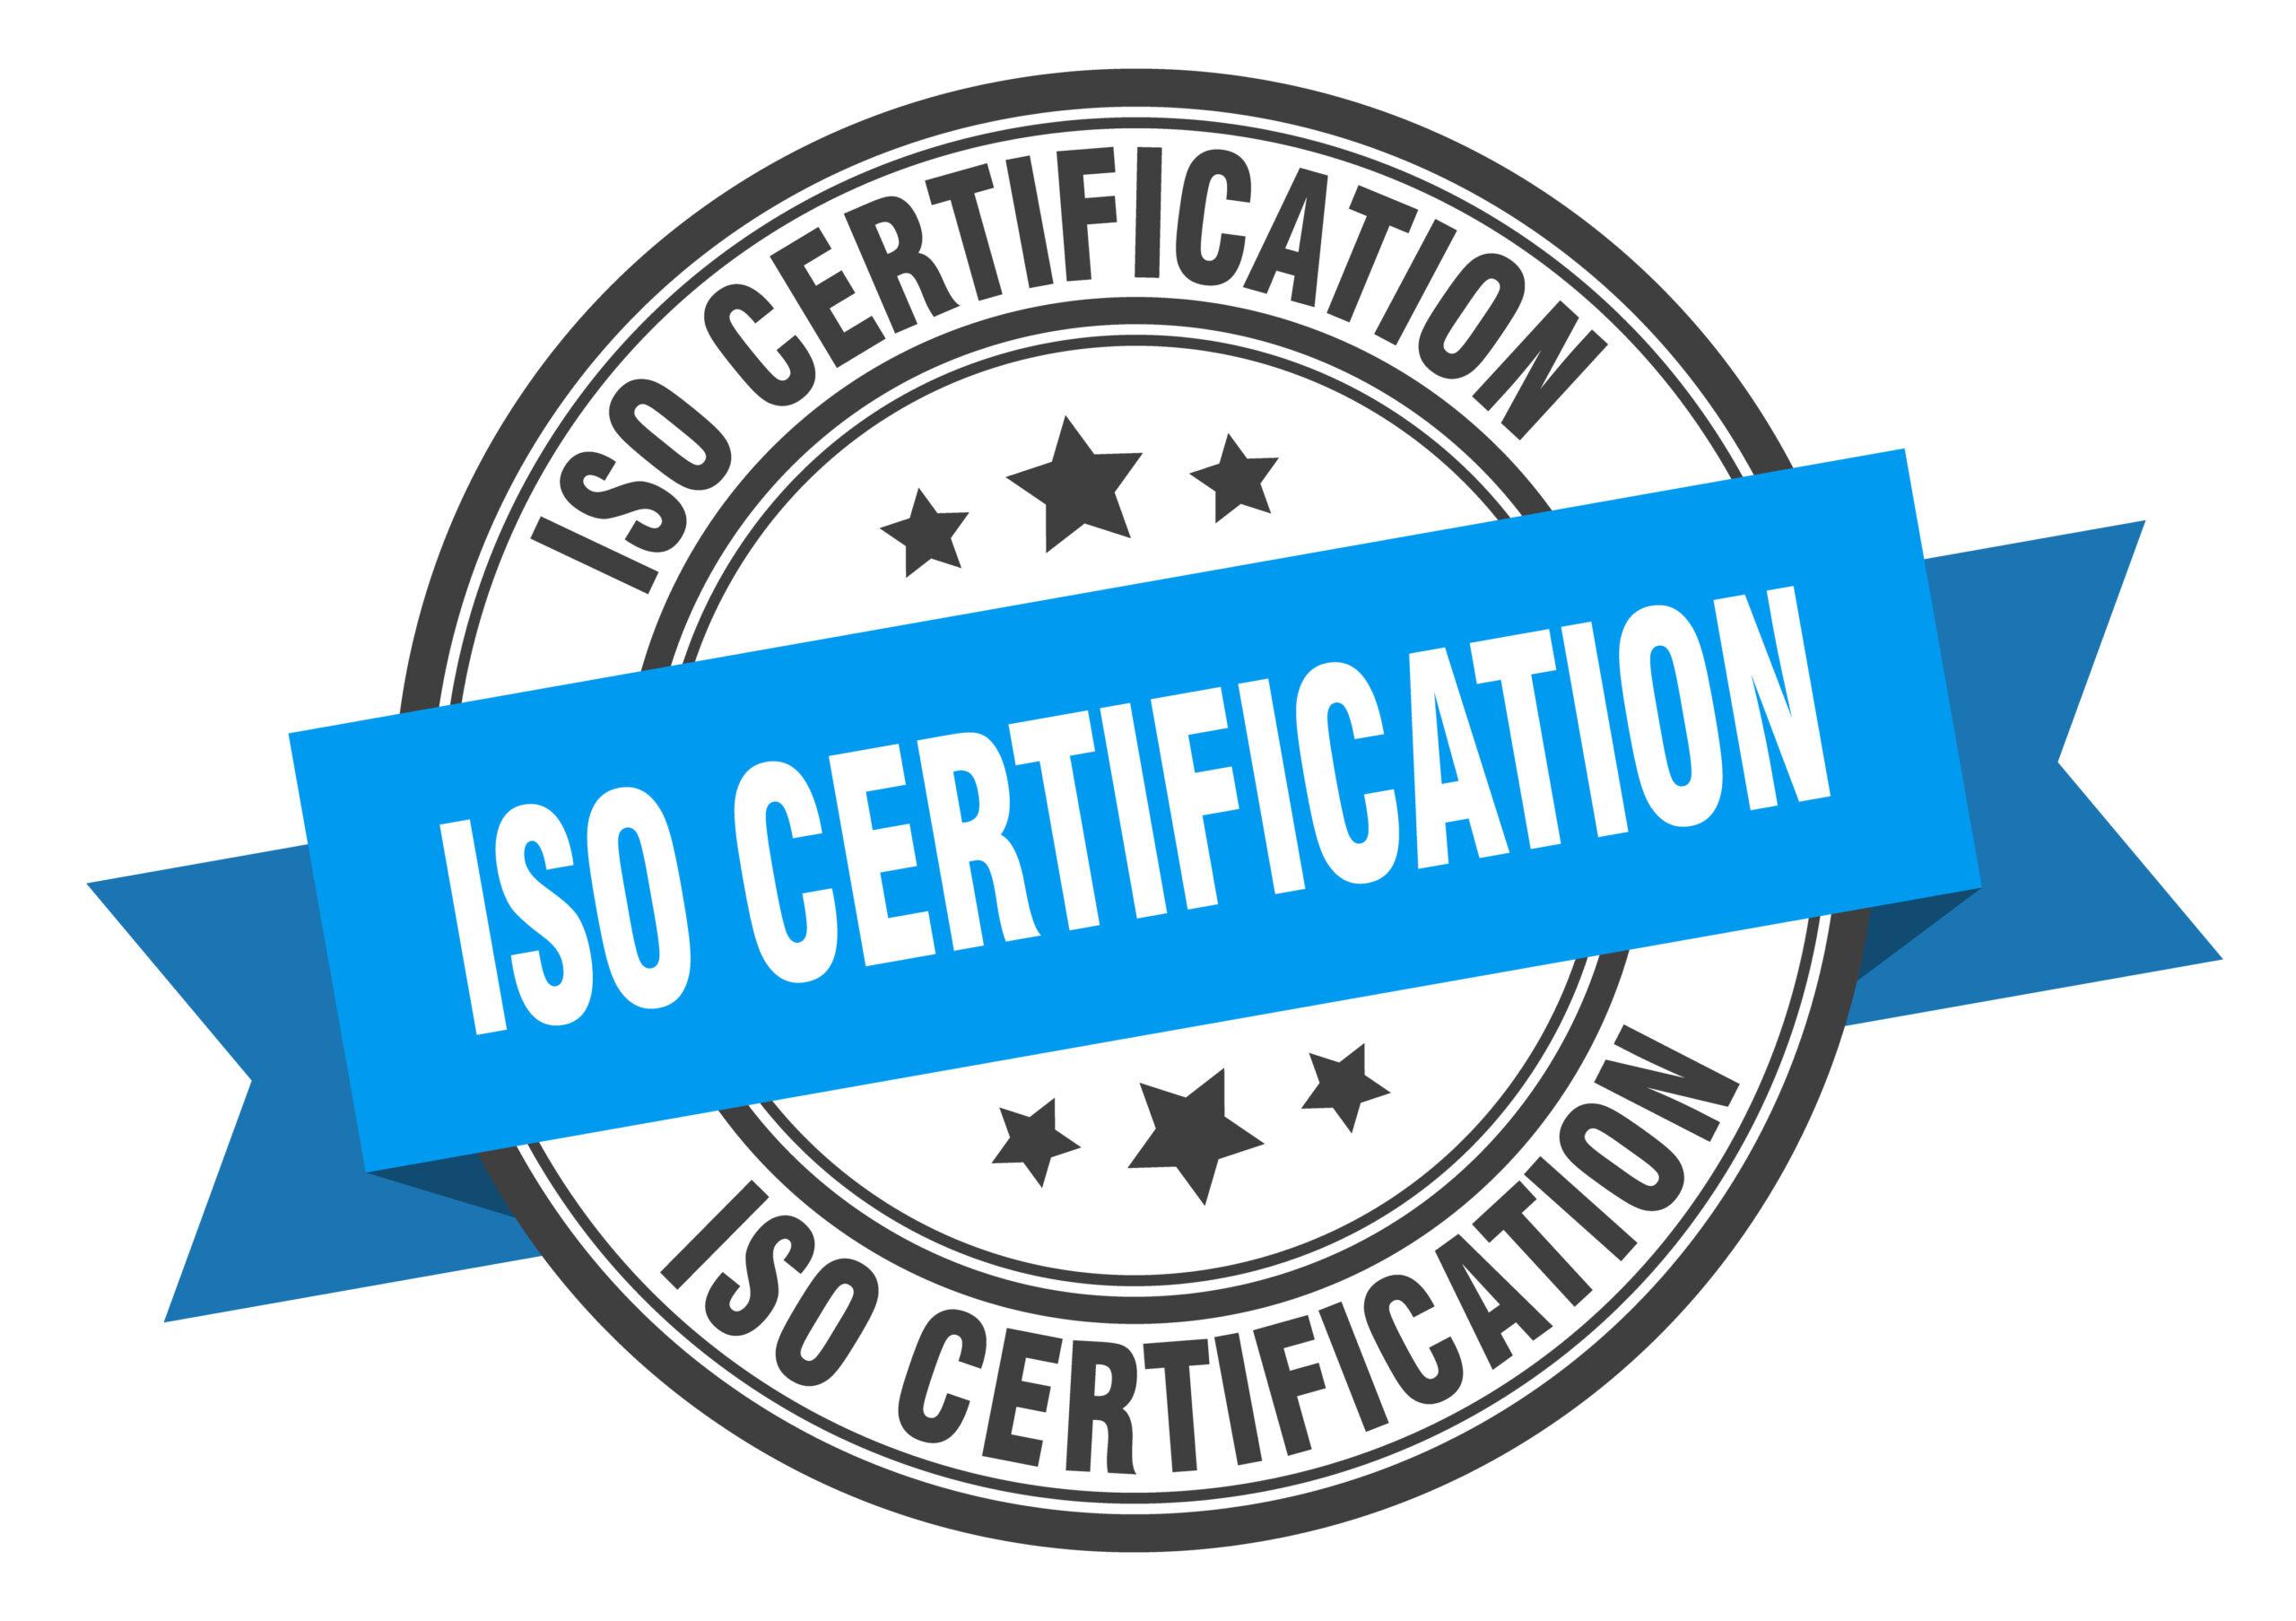 Certification Marks